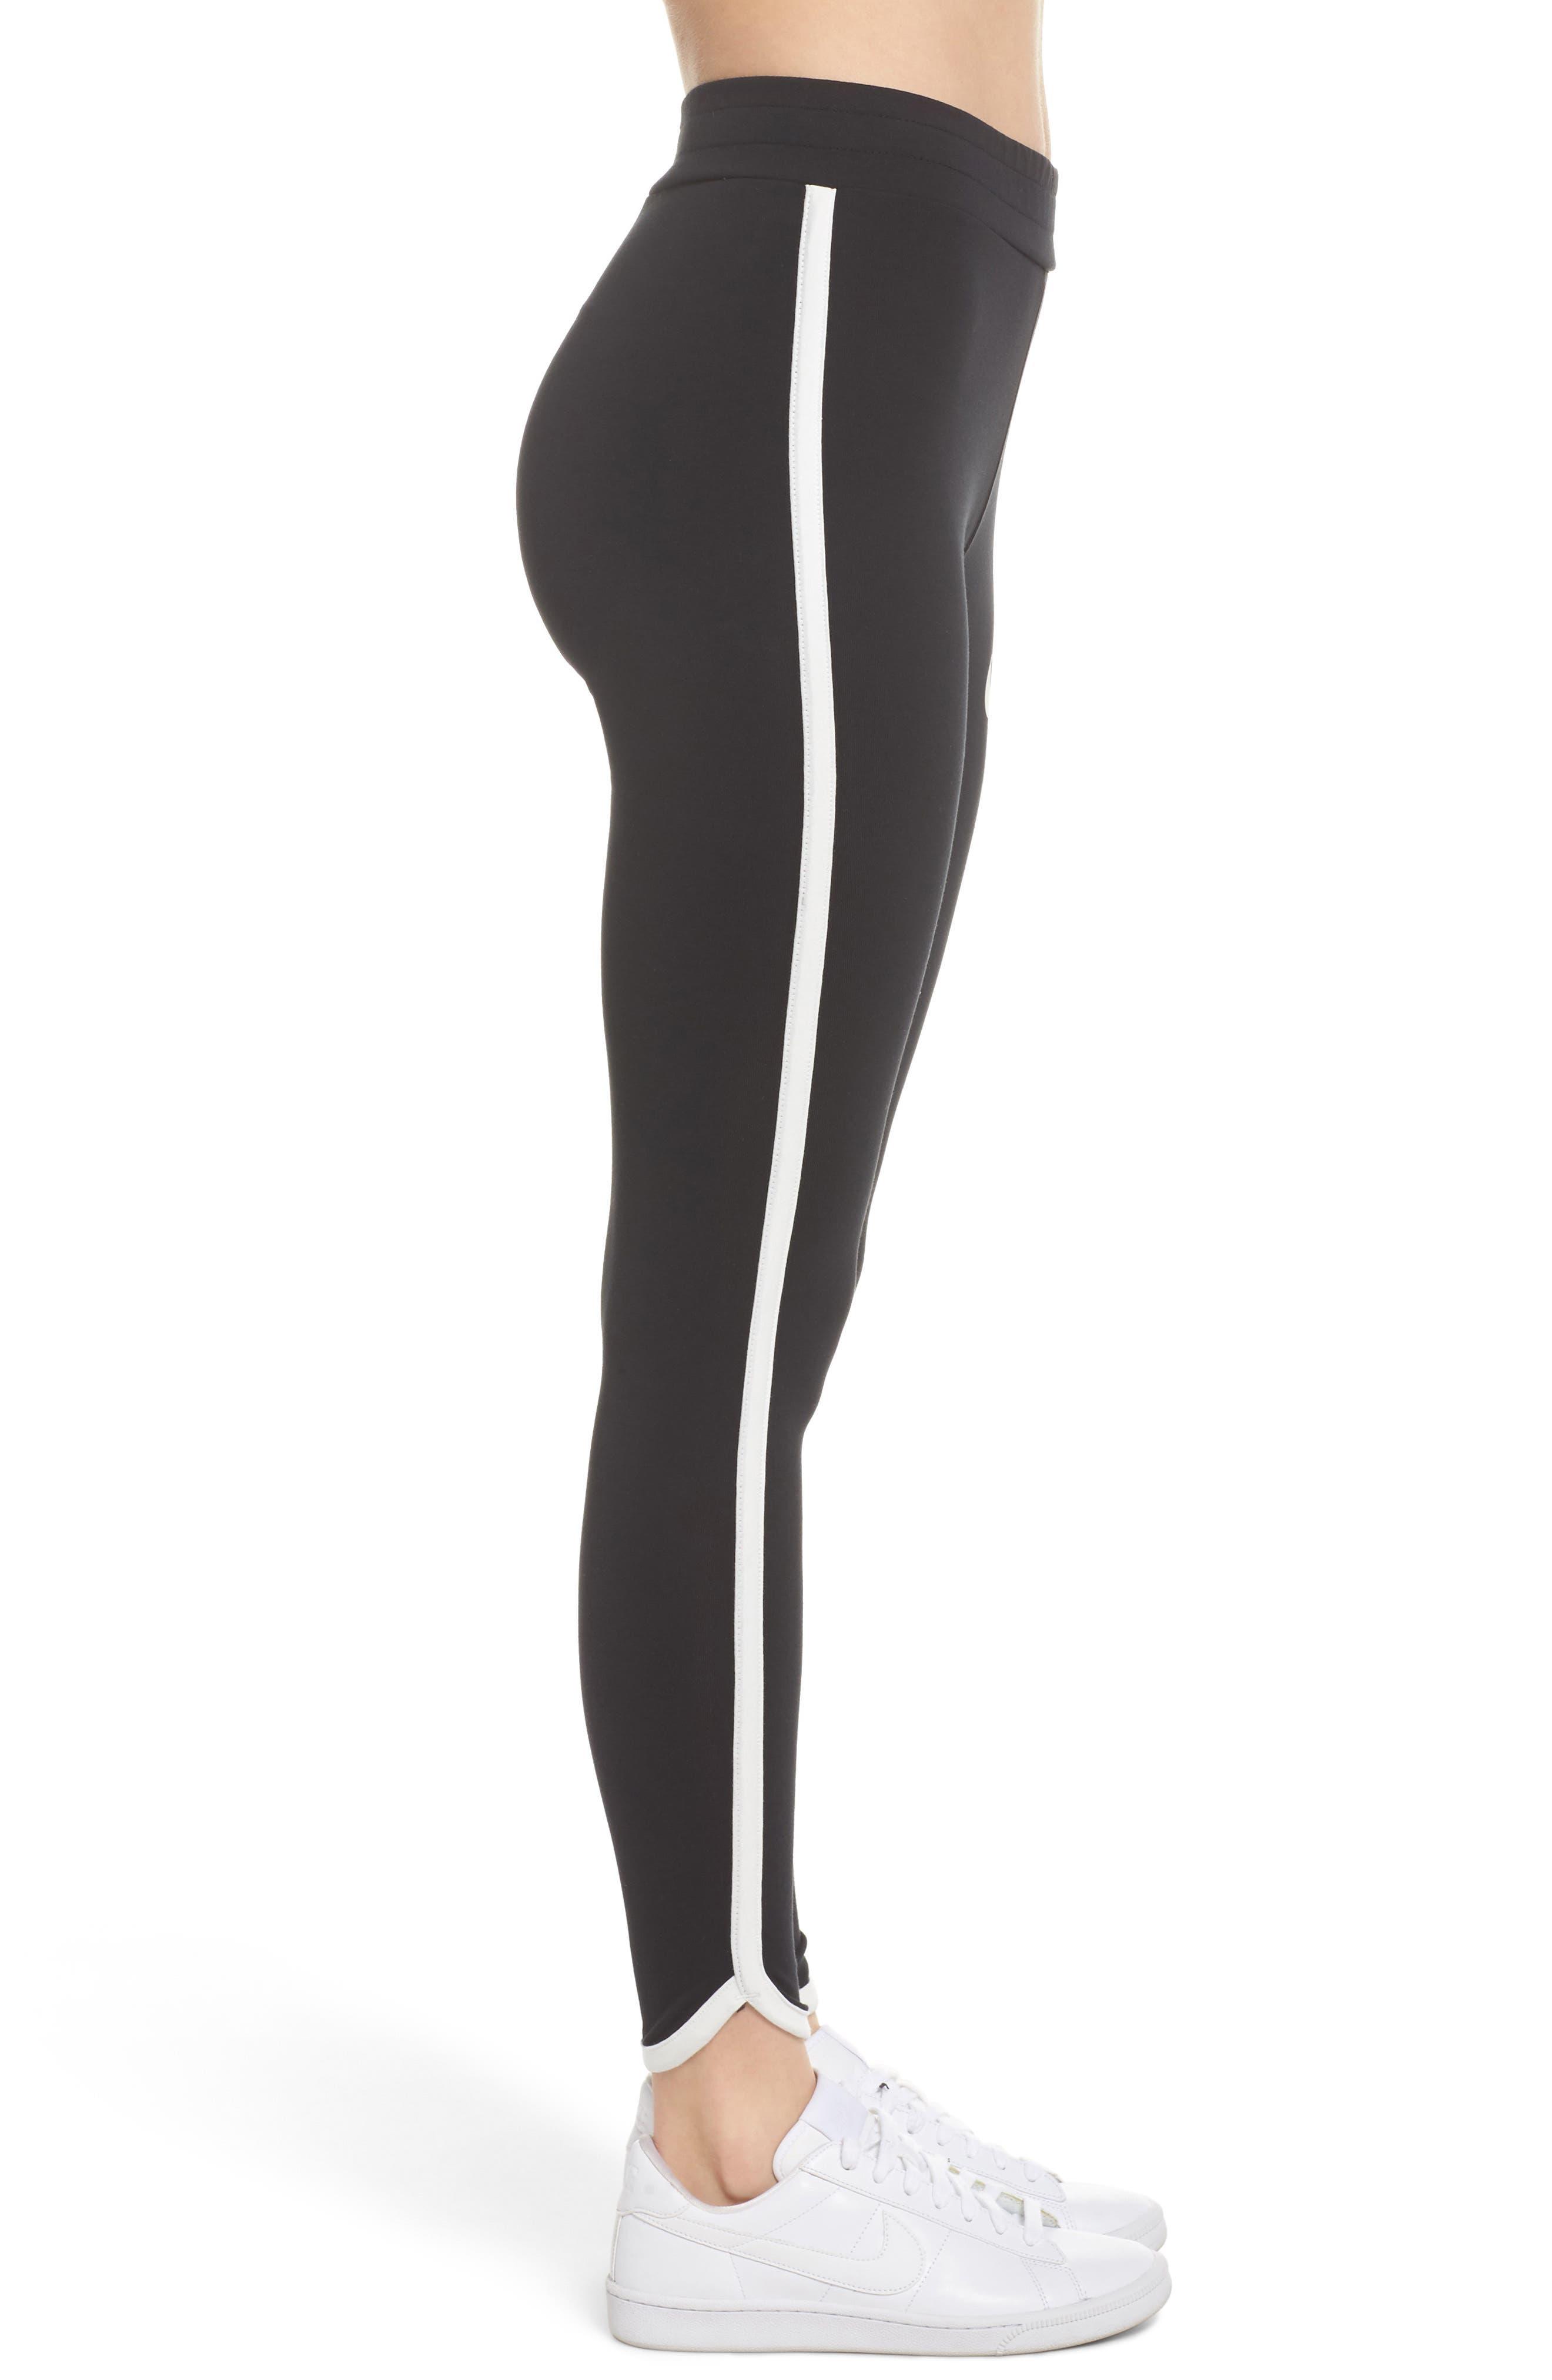 Sportswear Women's Leggings,                             Alternate thumbnail 6, color,                             010